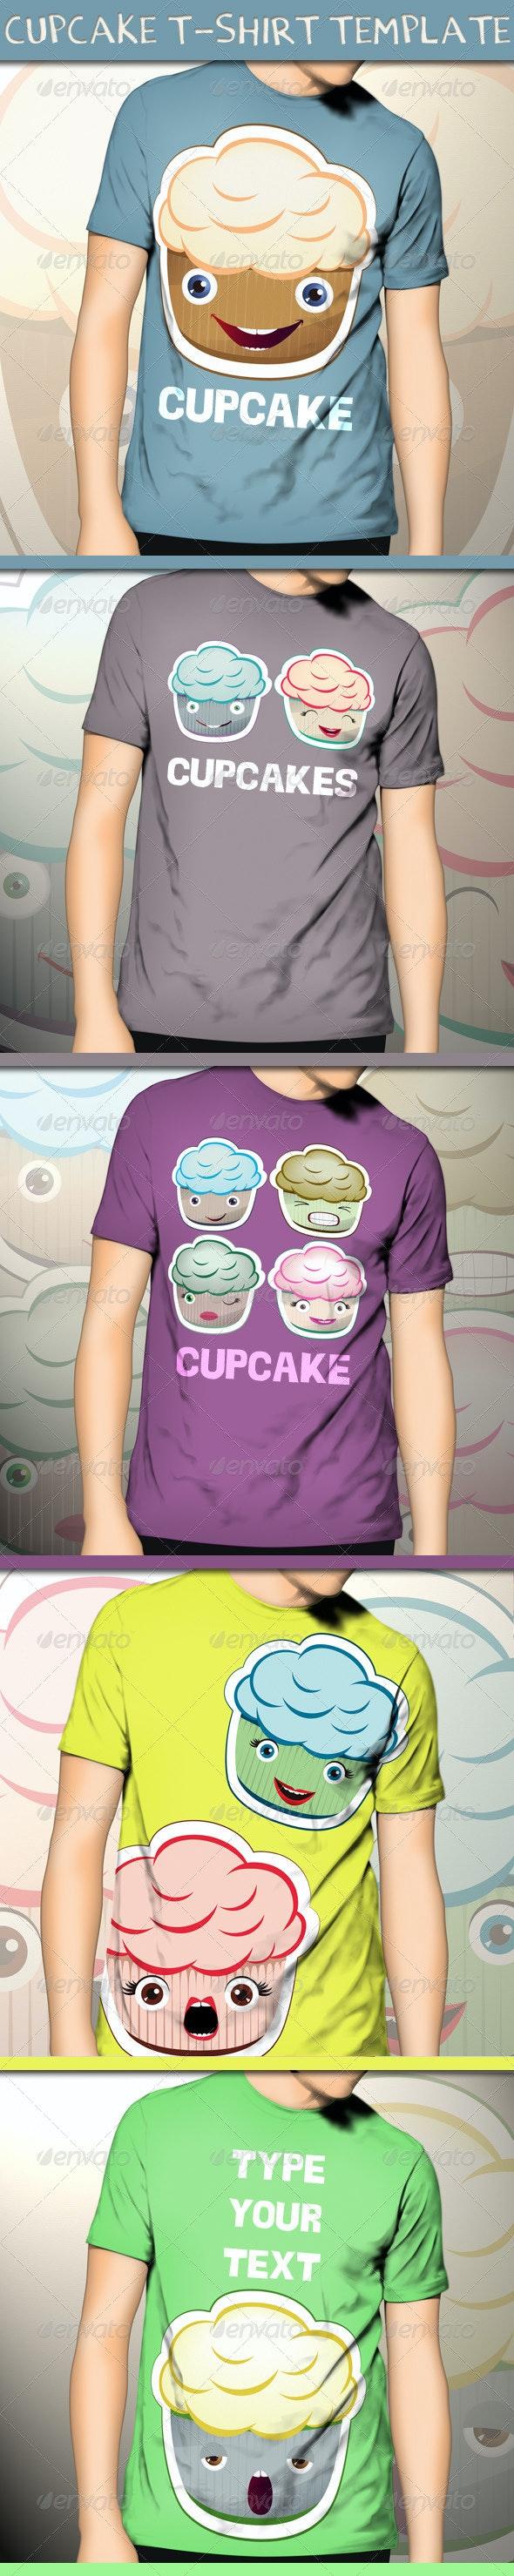 Cupcake T-Shirt Template - Funny Designs